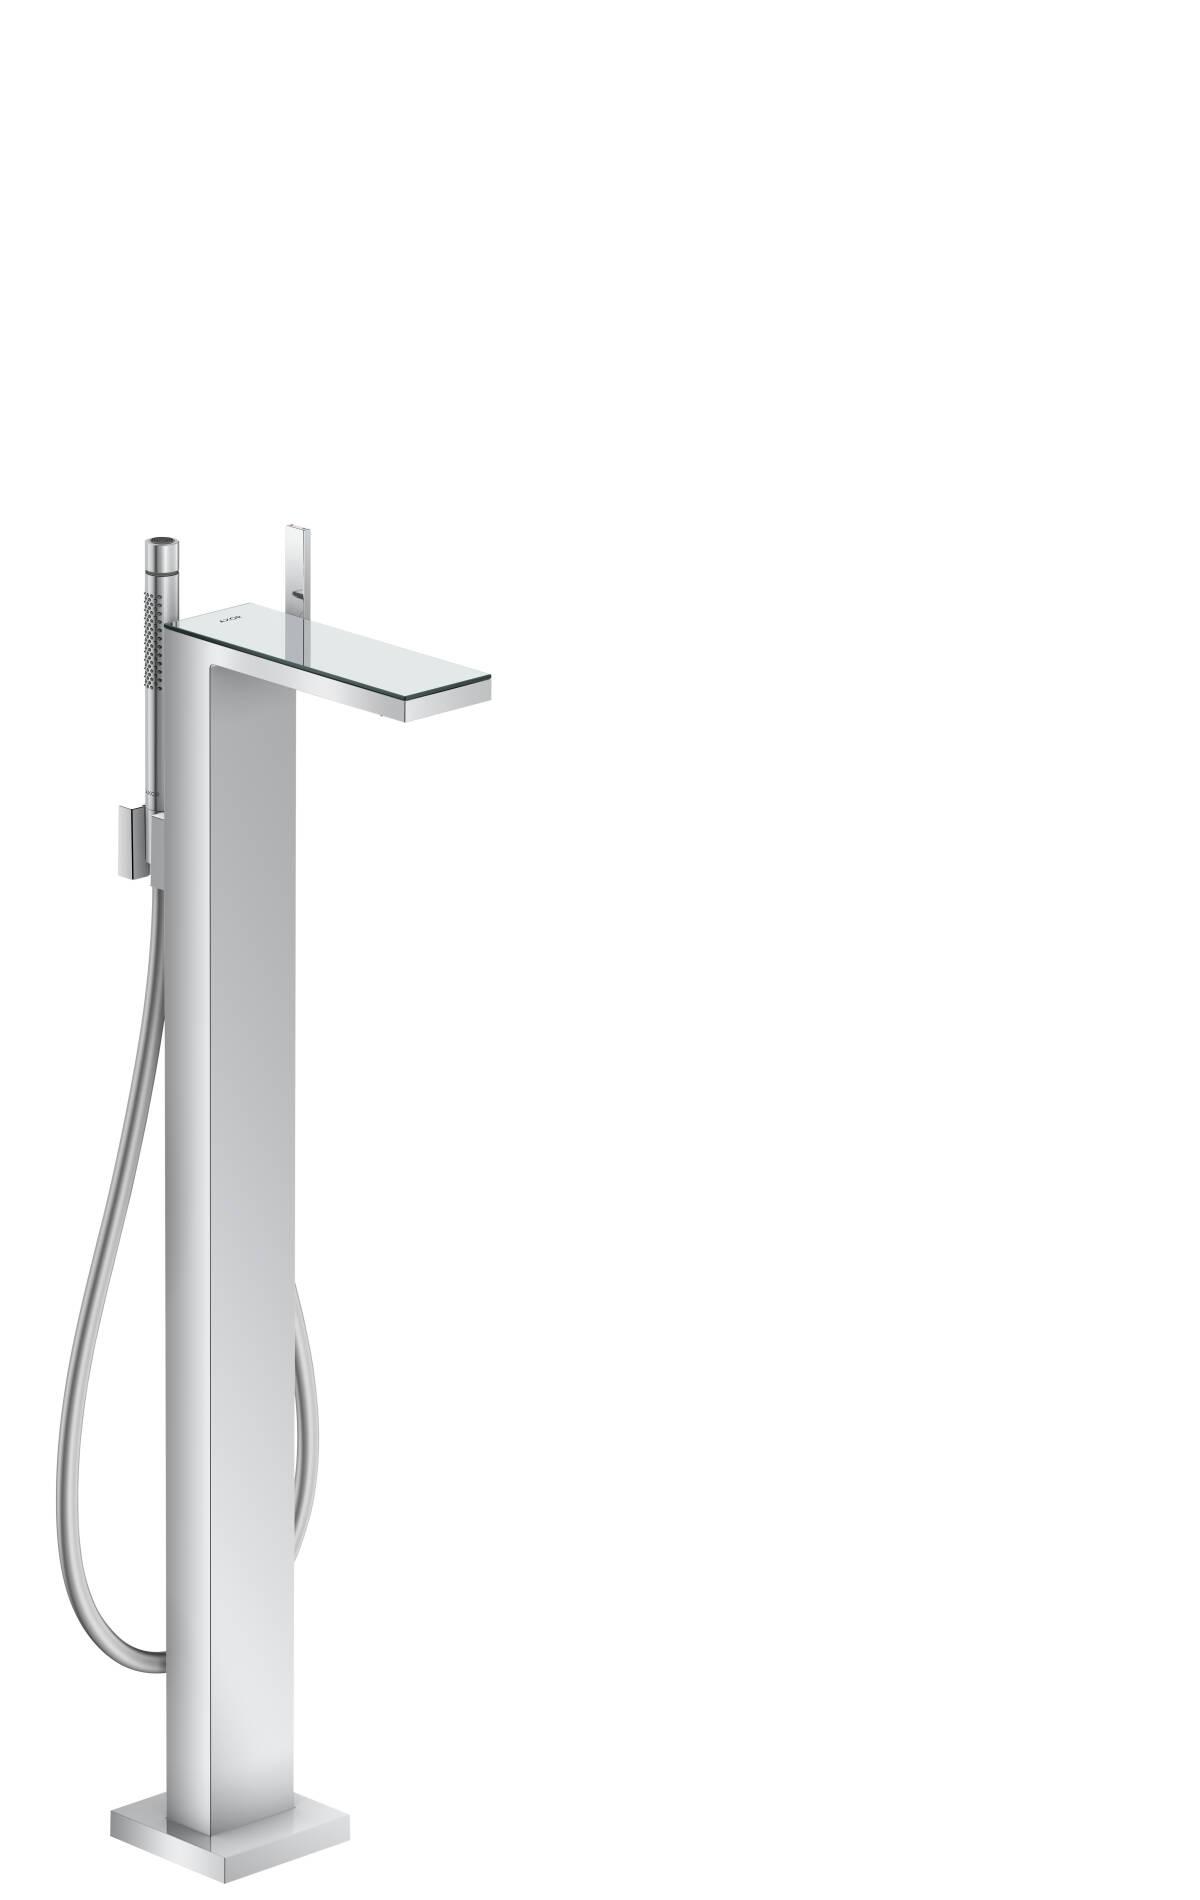 Single lever bath mixer floor-standing, Chrome/Mirror Glass, 47440000